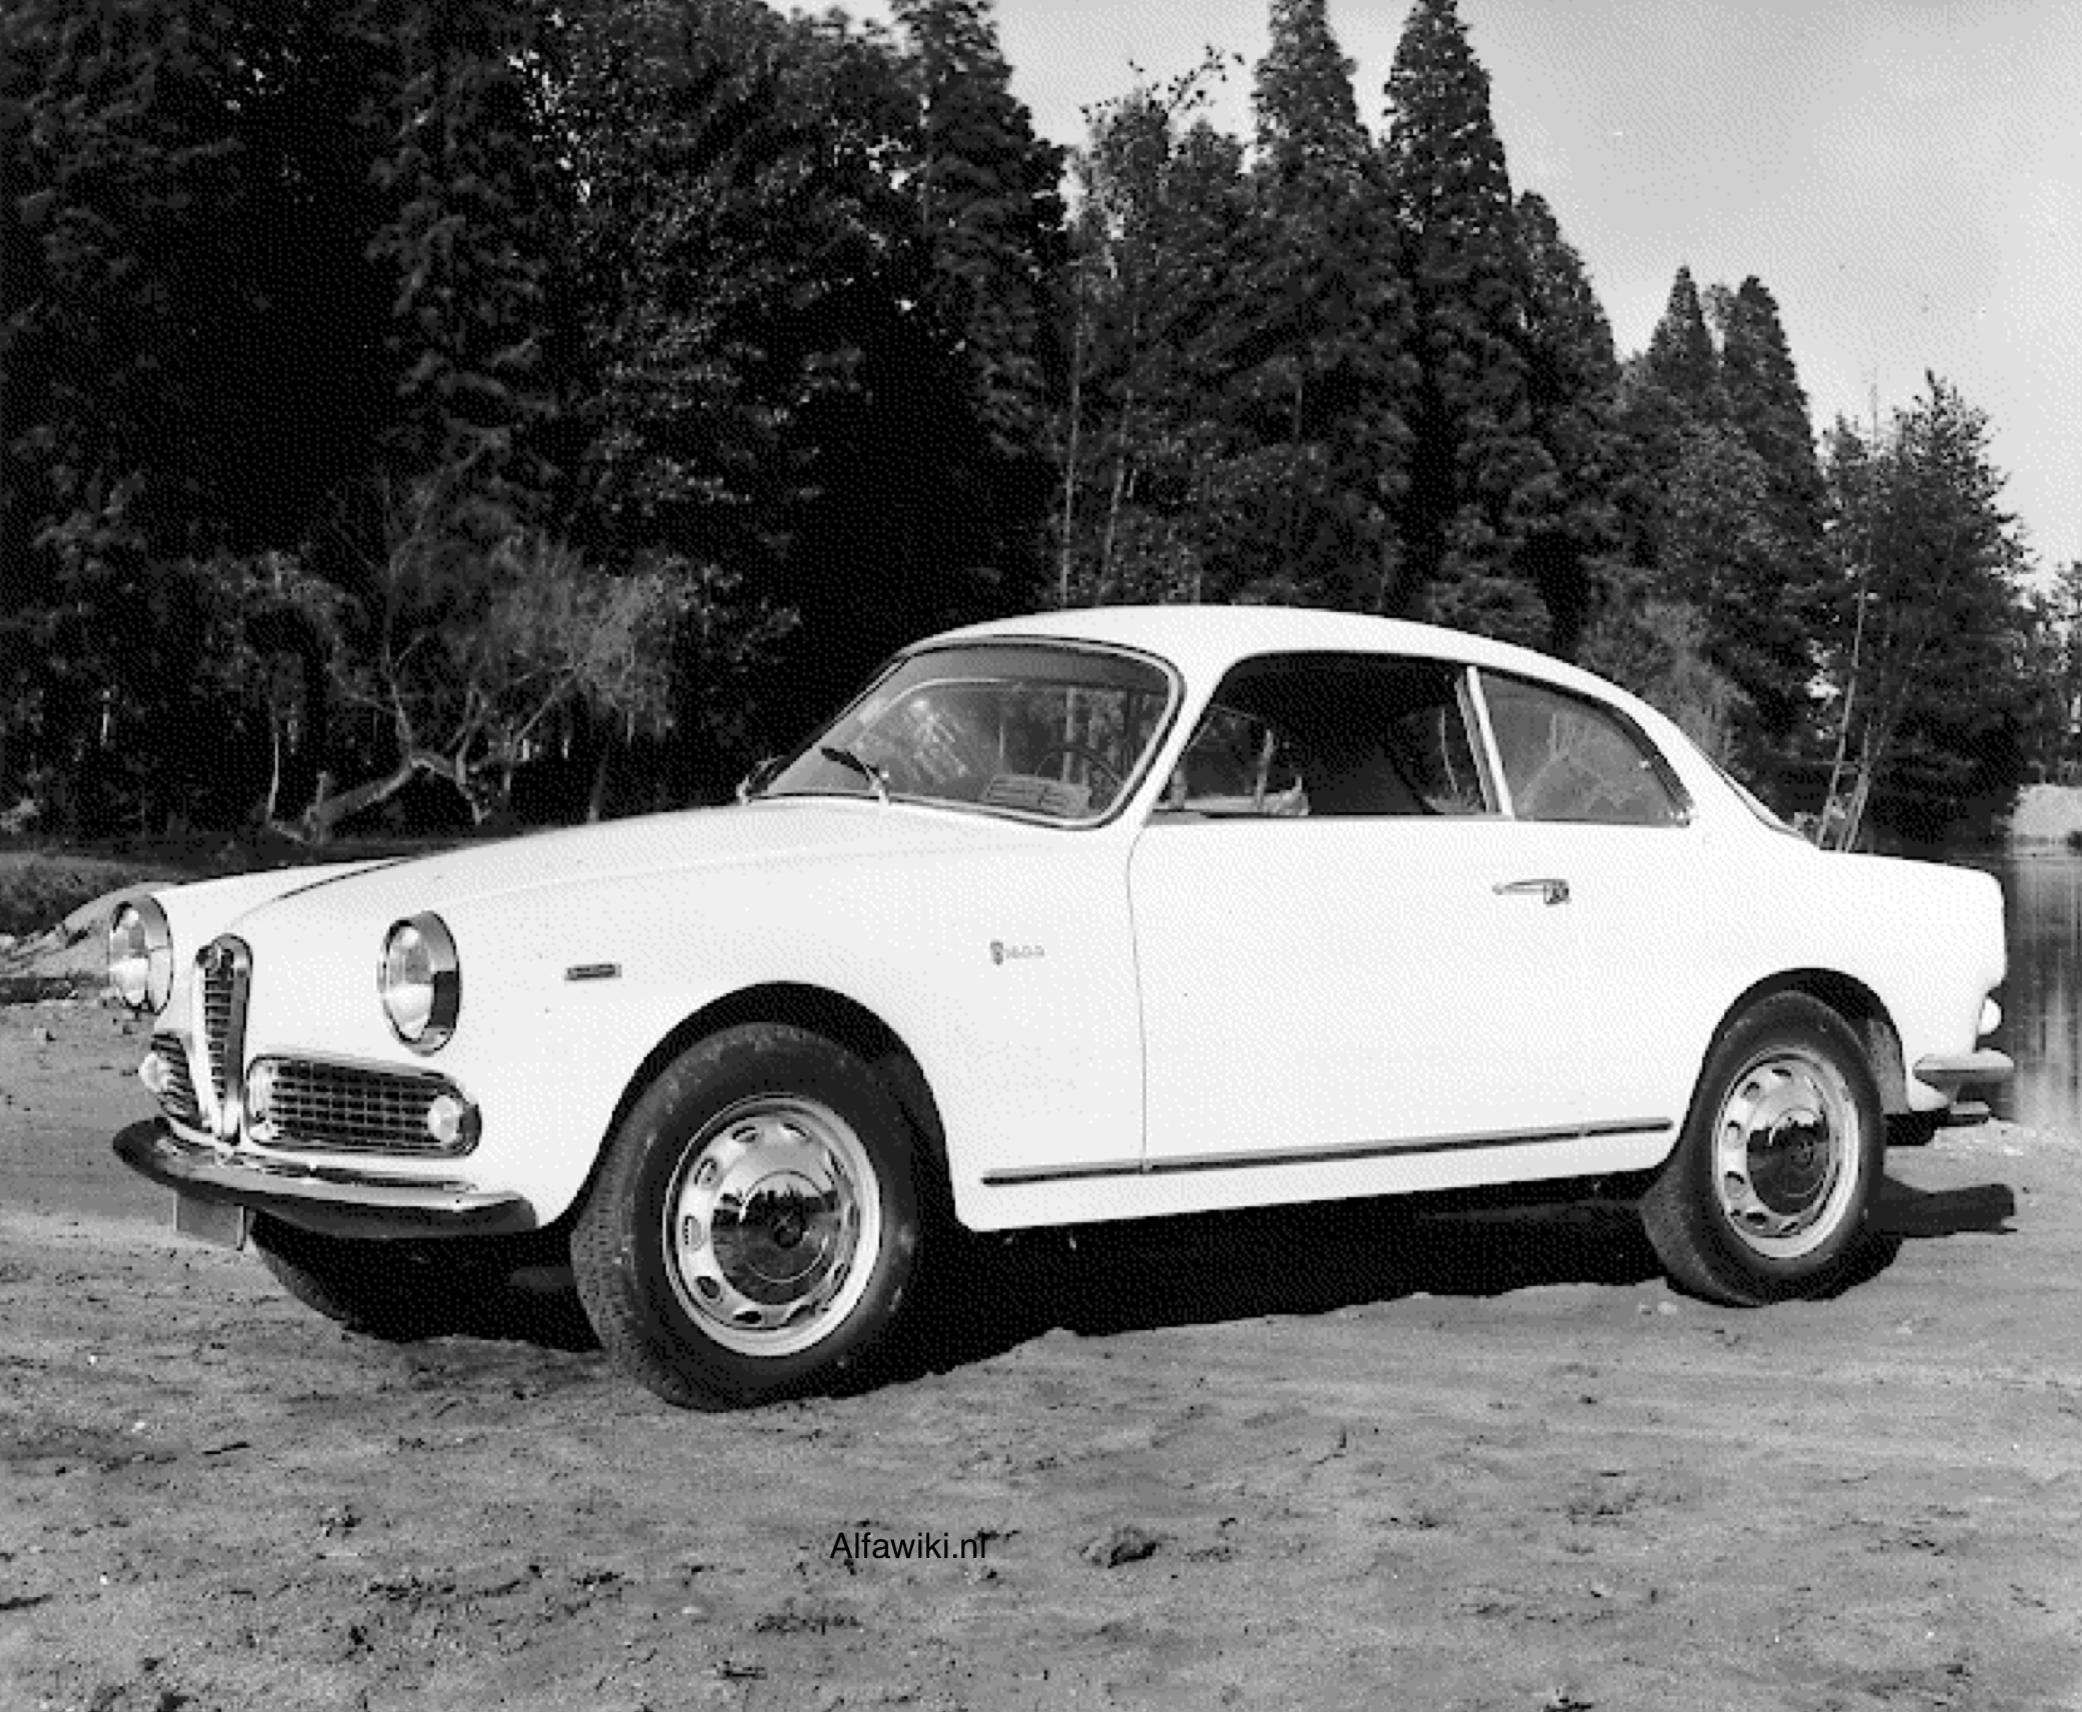 Alfa Romeo Giulia Sprint press photos